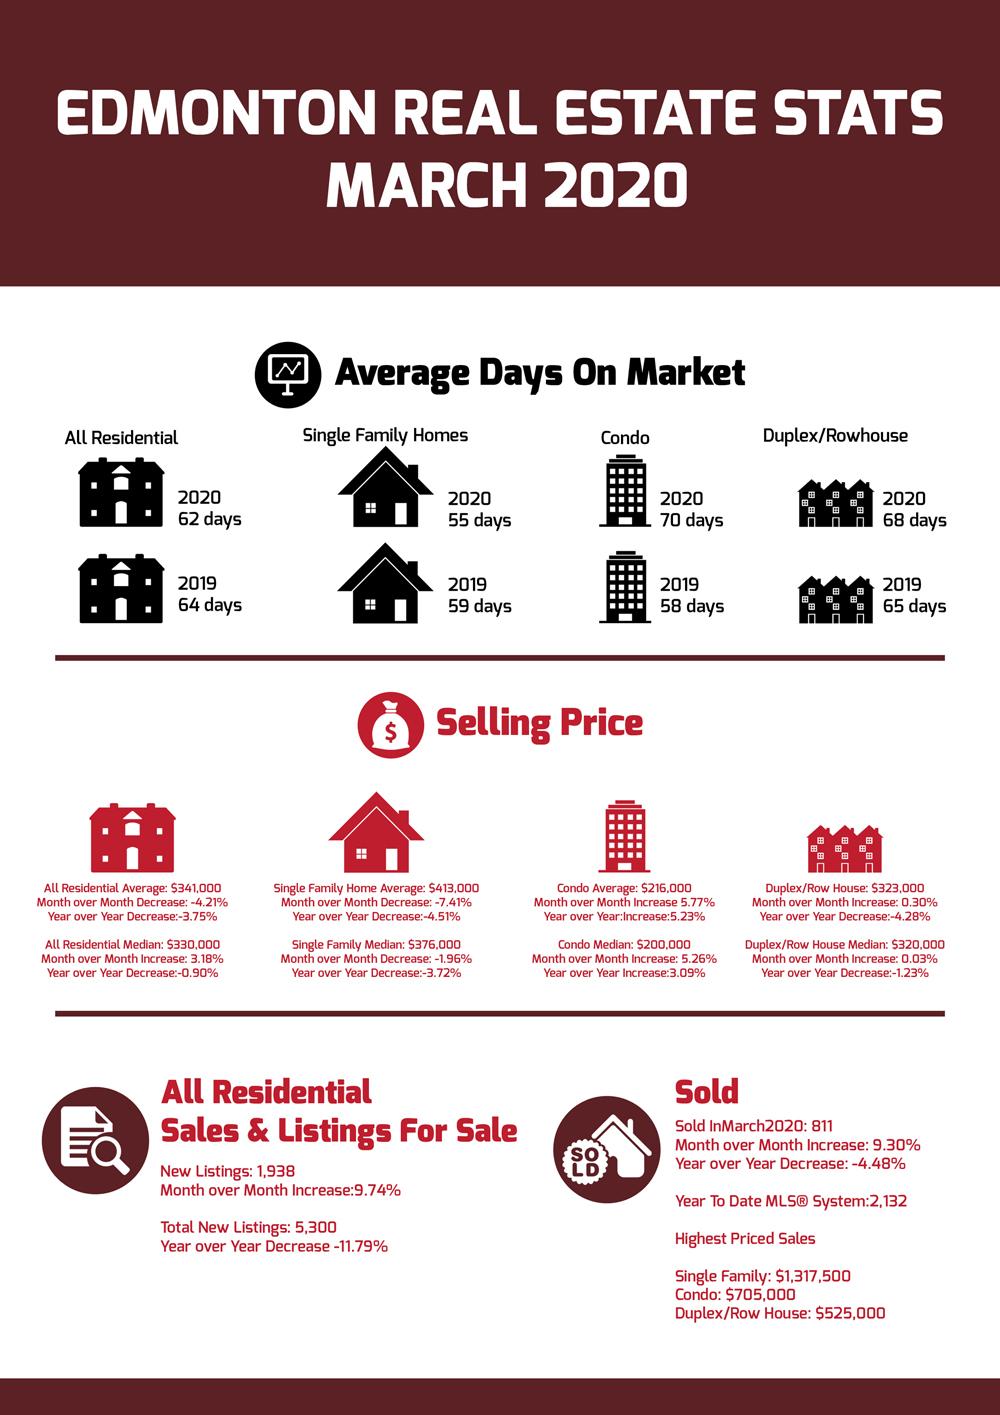 Edmonton Real Estate Stats March 2020